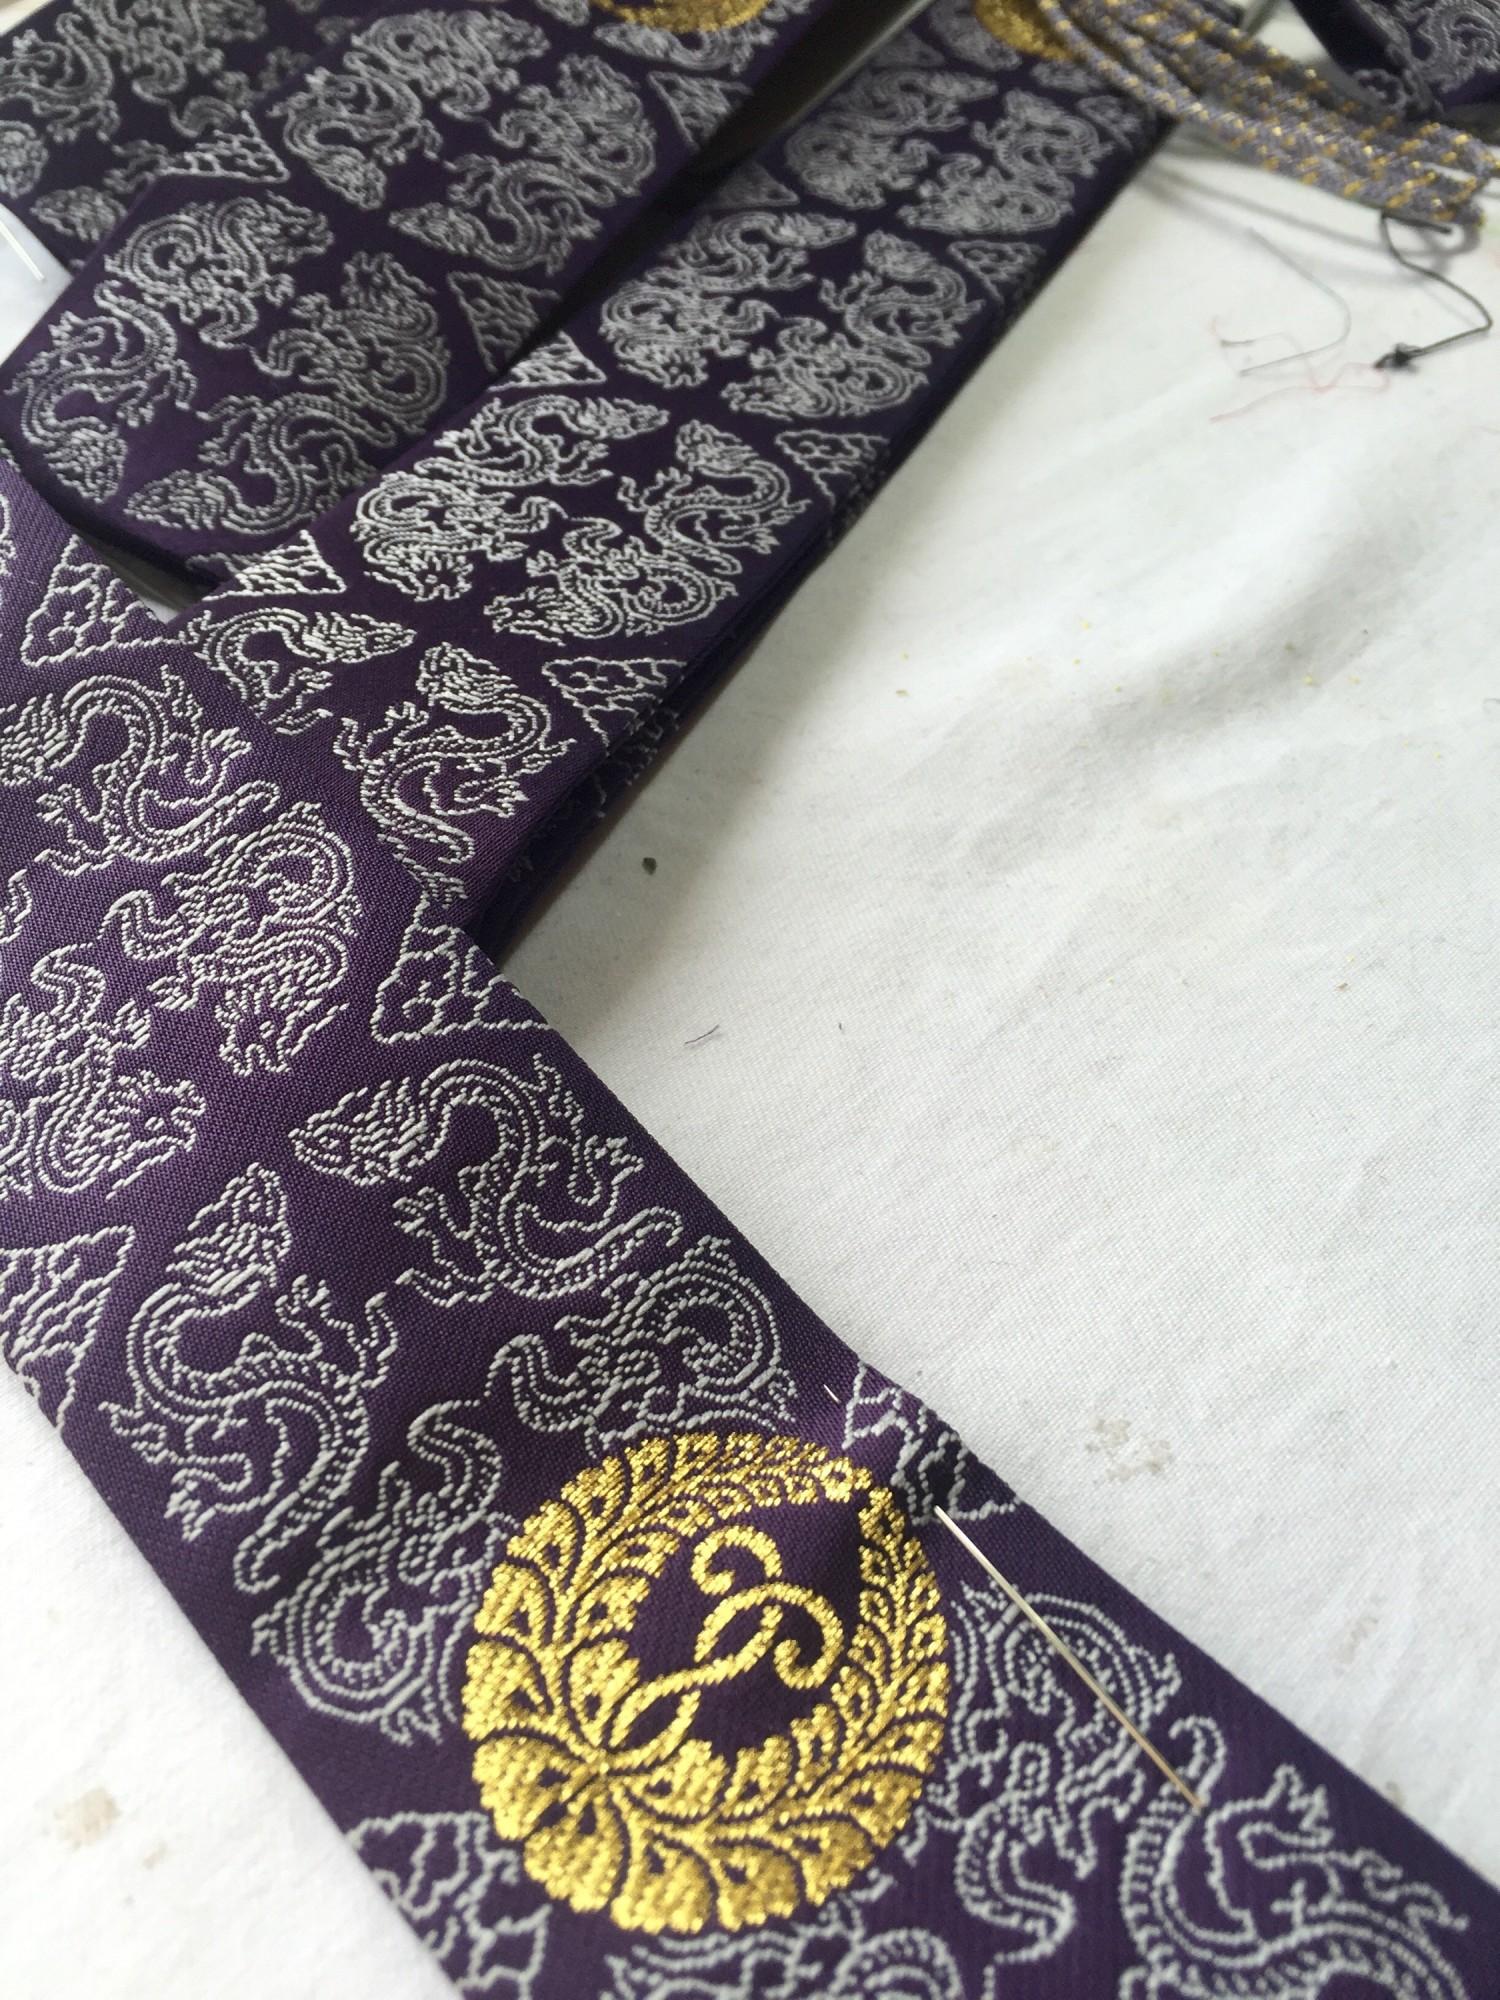 Buddhism kyoto tradition naoshichi fabric repair 専如門主伝統奉告法要記念式章 川勝直七